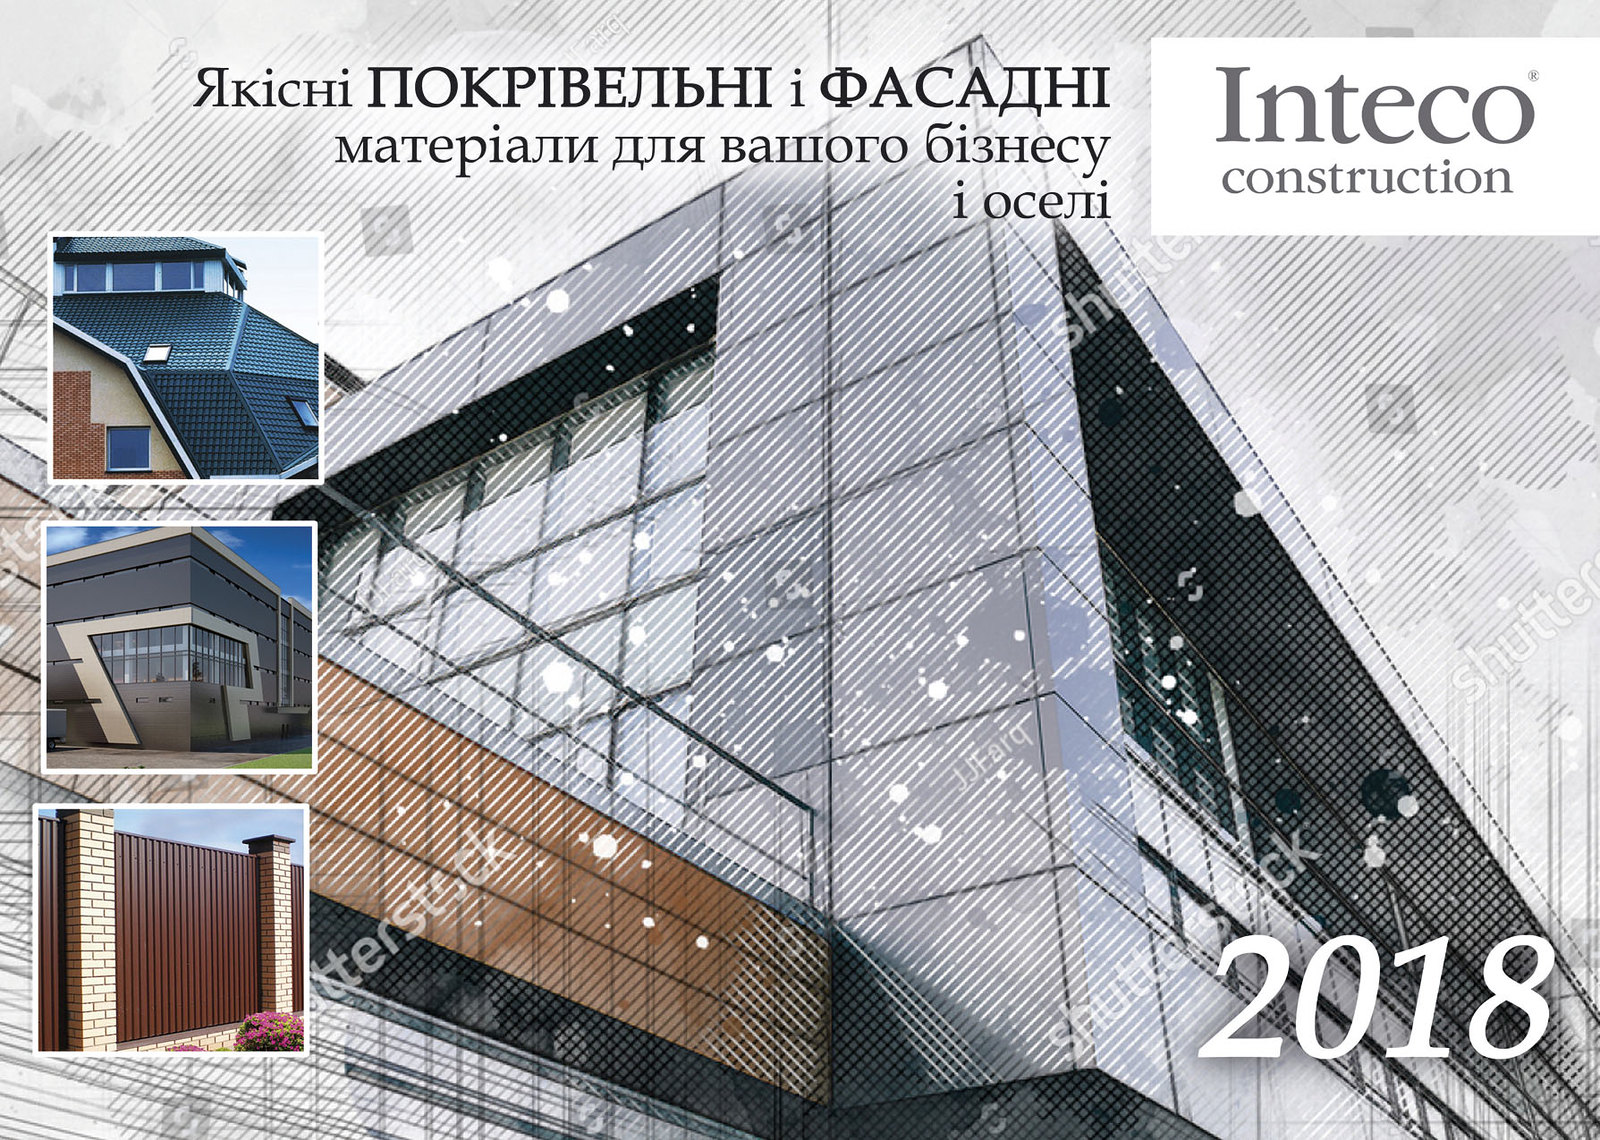 (01) Kalend Inteco 01 verh 12